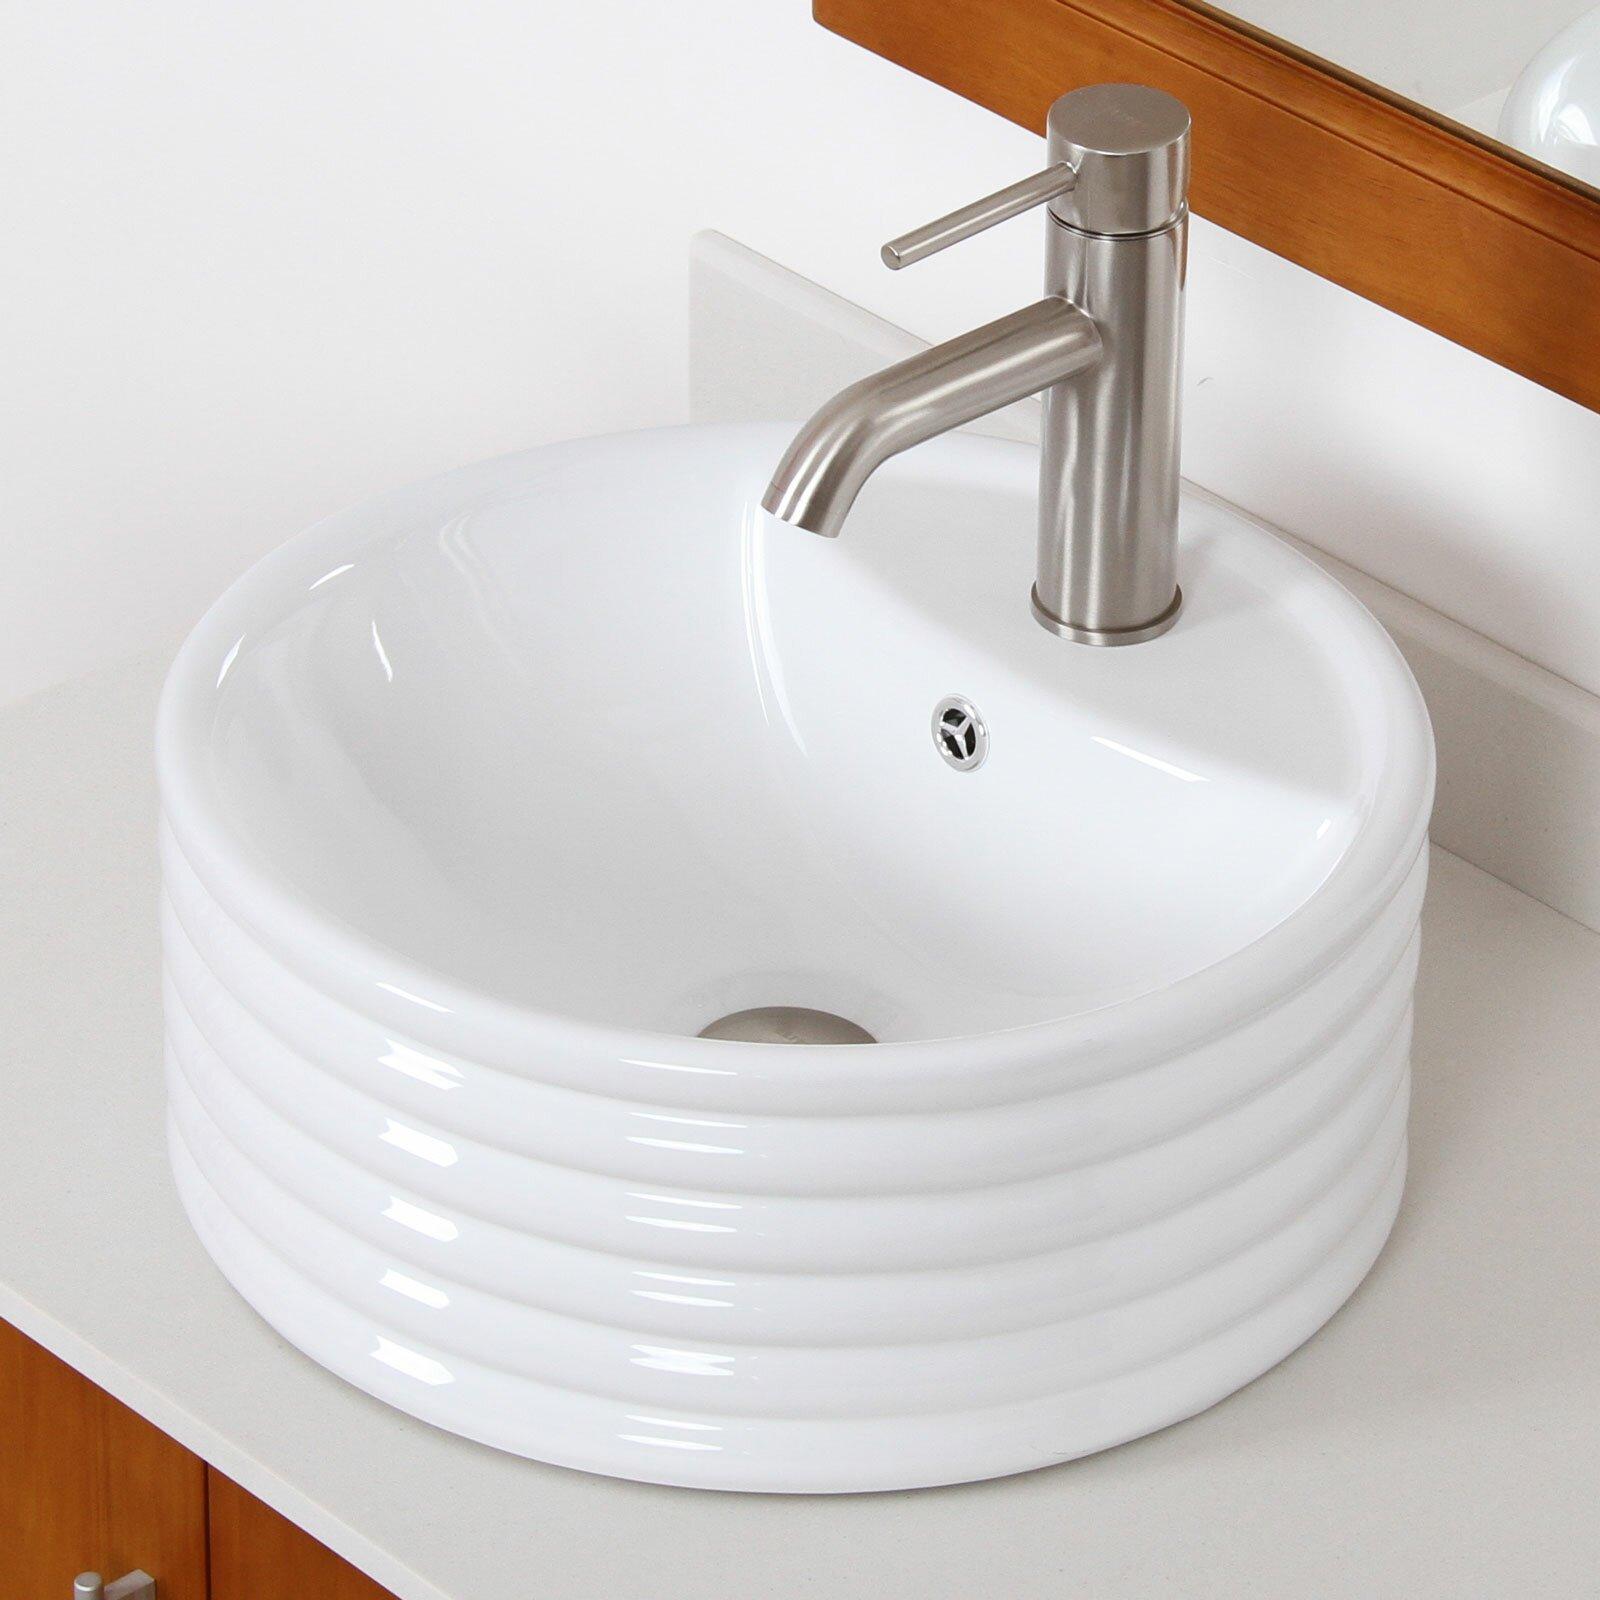 Elite Single Handle Bathroom Sink Faucet with Horizontal ...